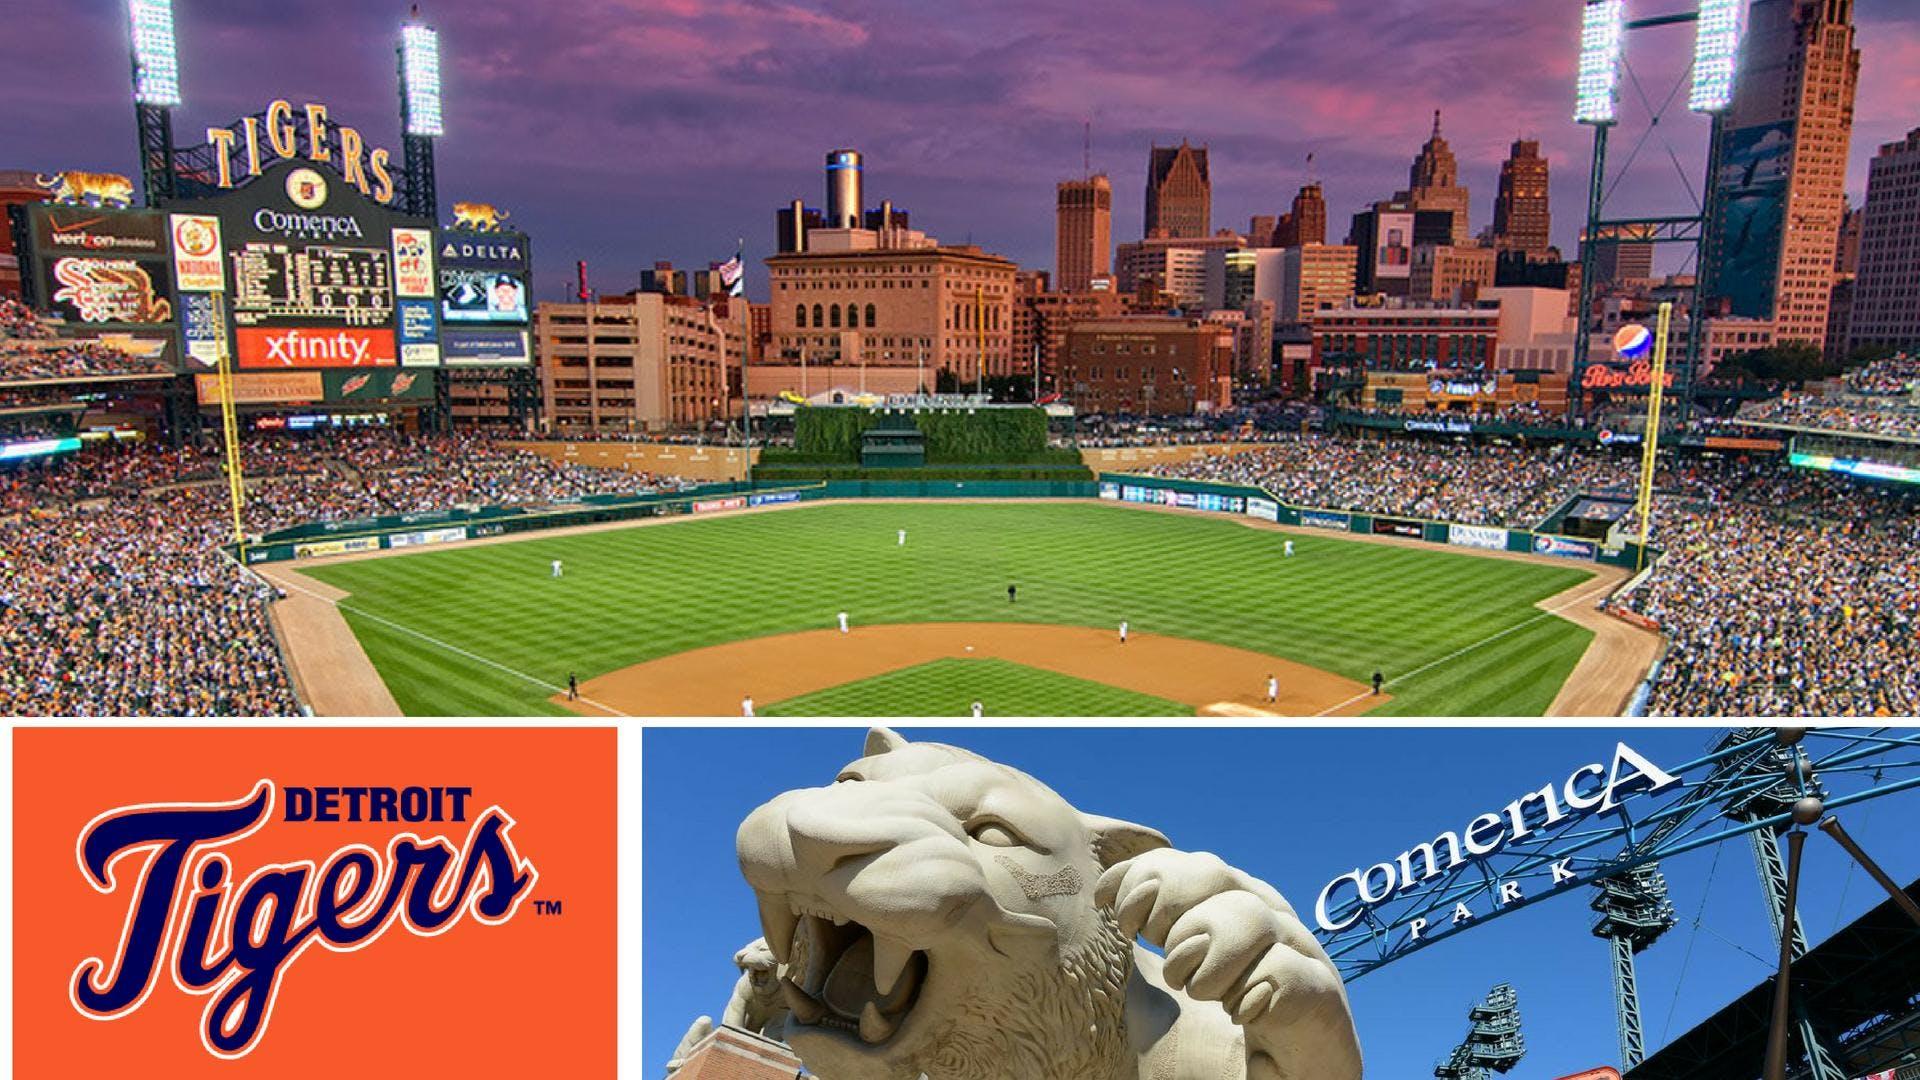 Detroit Tigers Baseball Game Round 2 7 Jul 2018